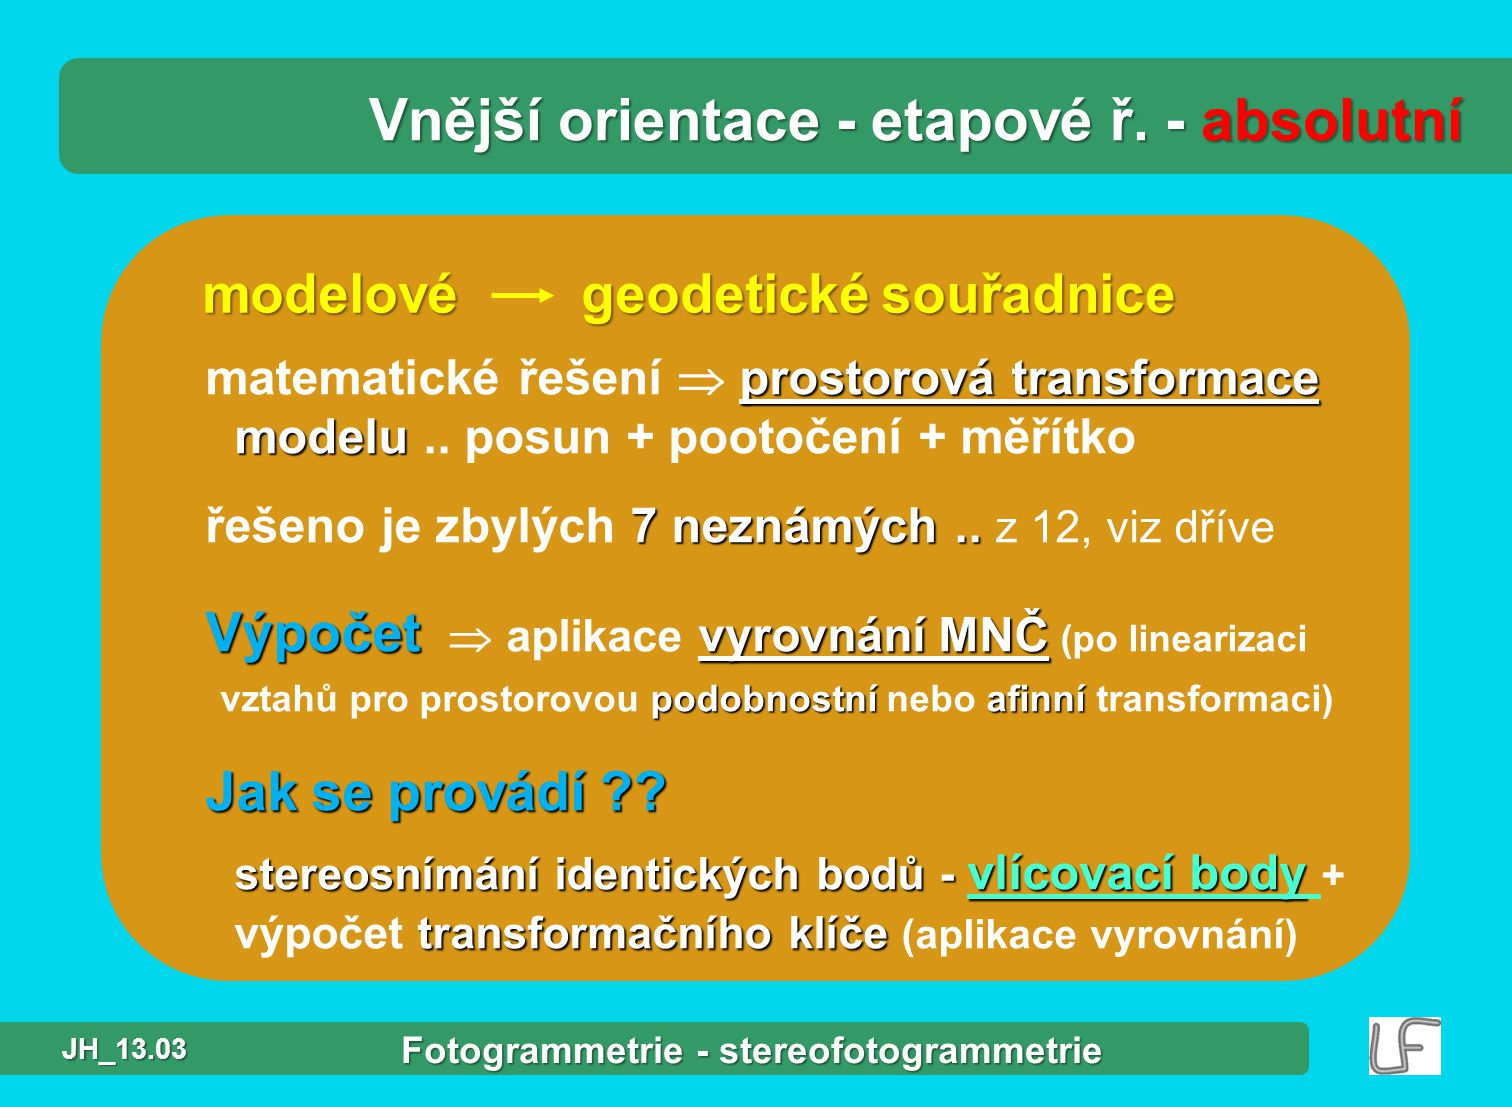 Fotogrammetrie - stereofotogrammetrie